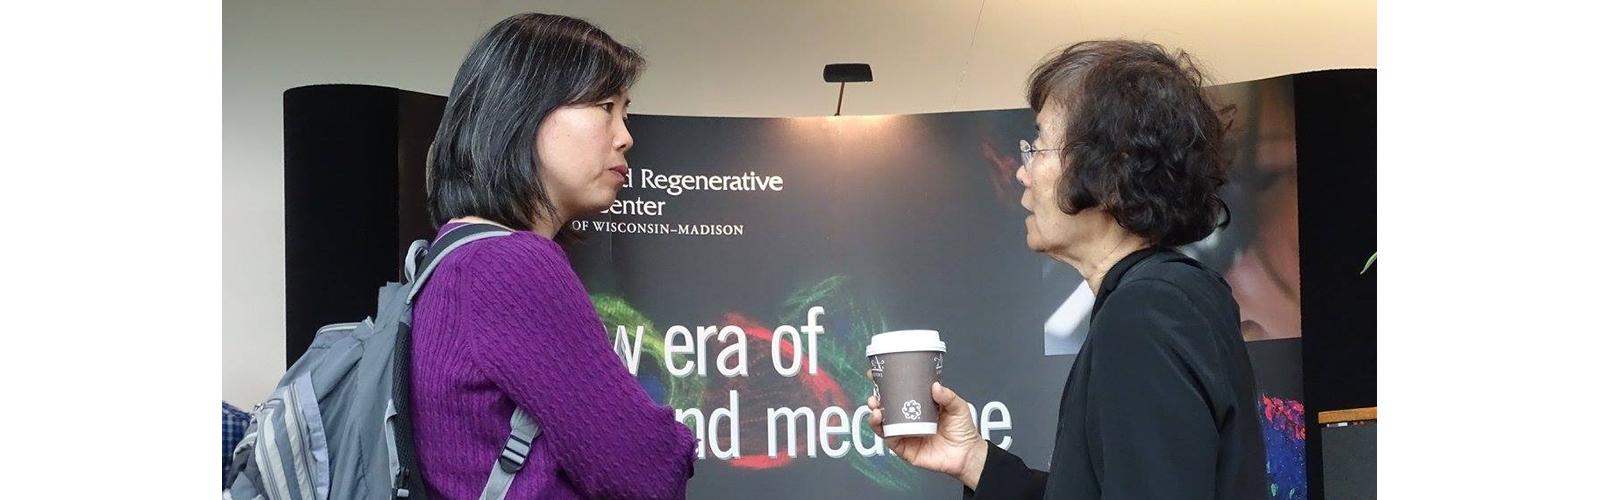 Xinyu Zhao and Ei Terasawa at Wisconsin Stem Cell Symposium